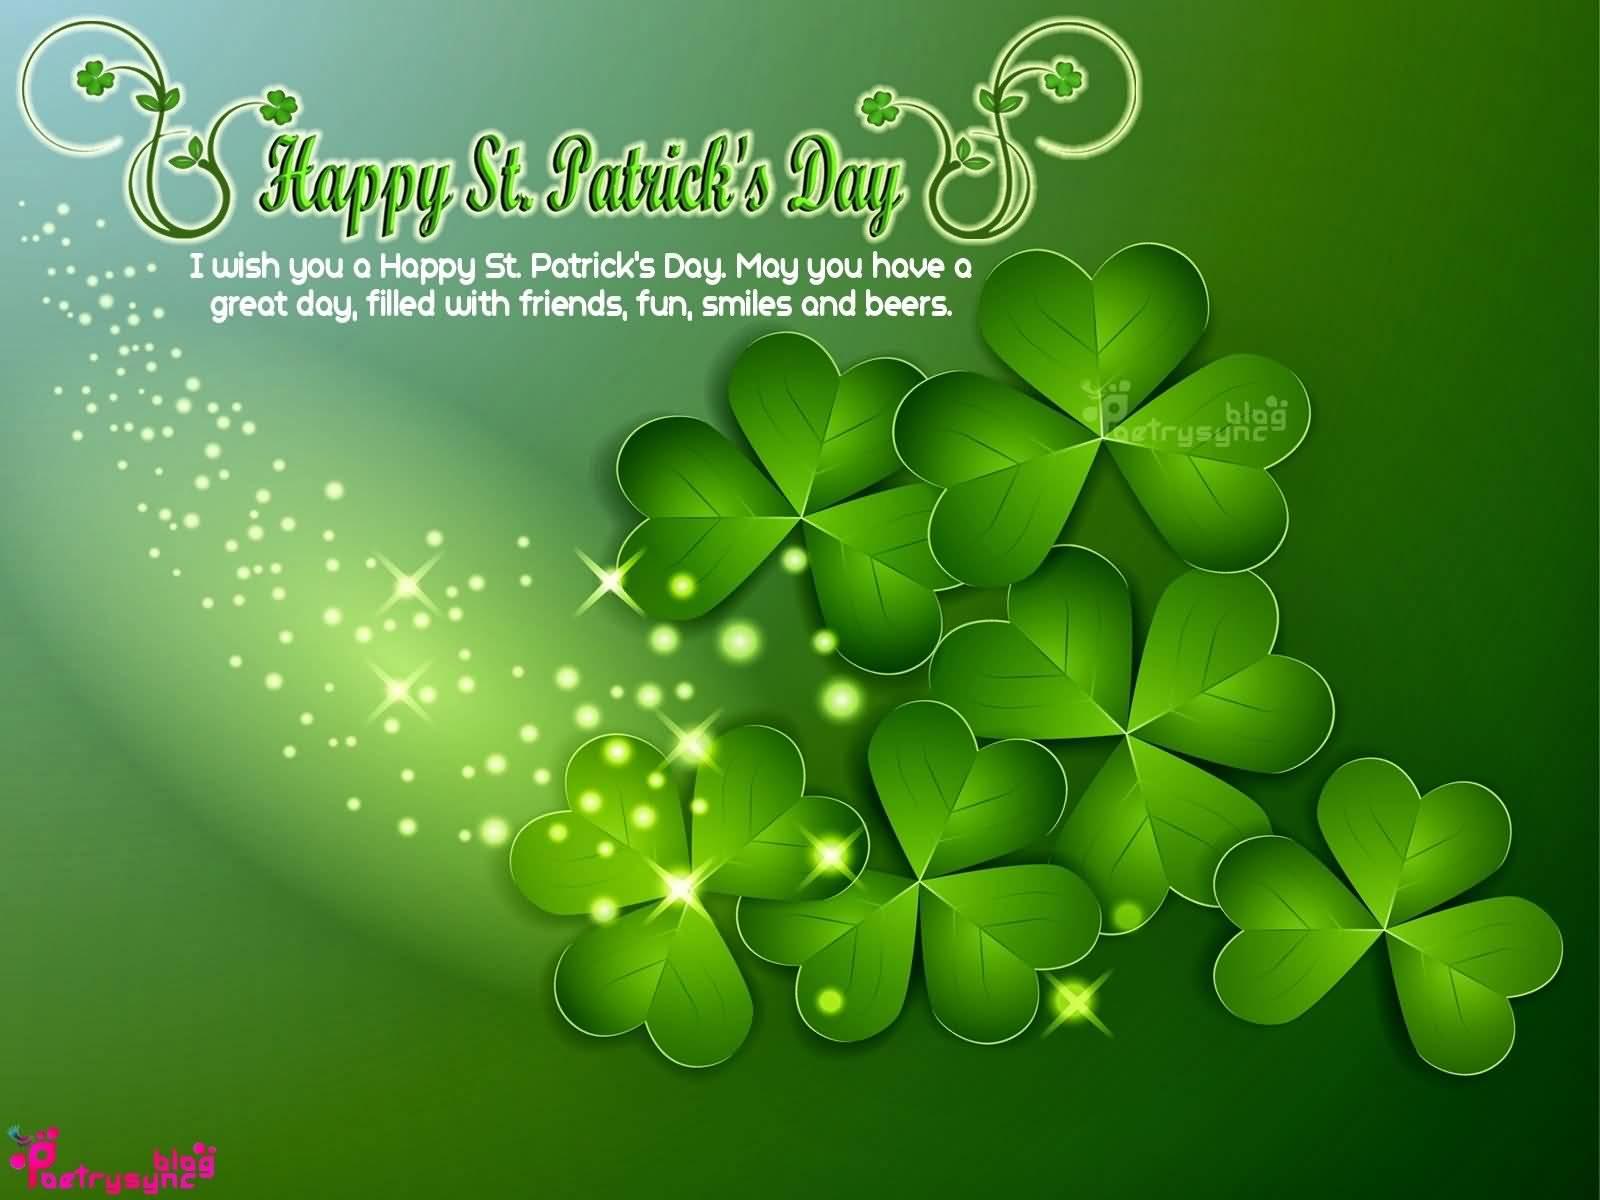 I Wish You A Happy Saint Patrick's Day 2017